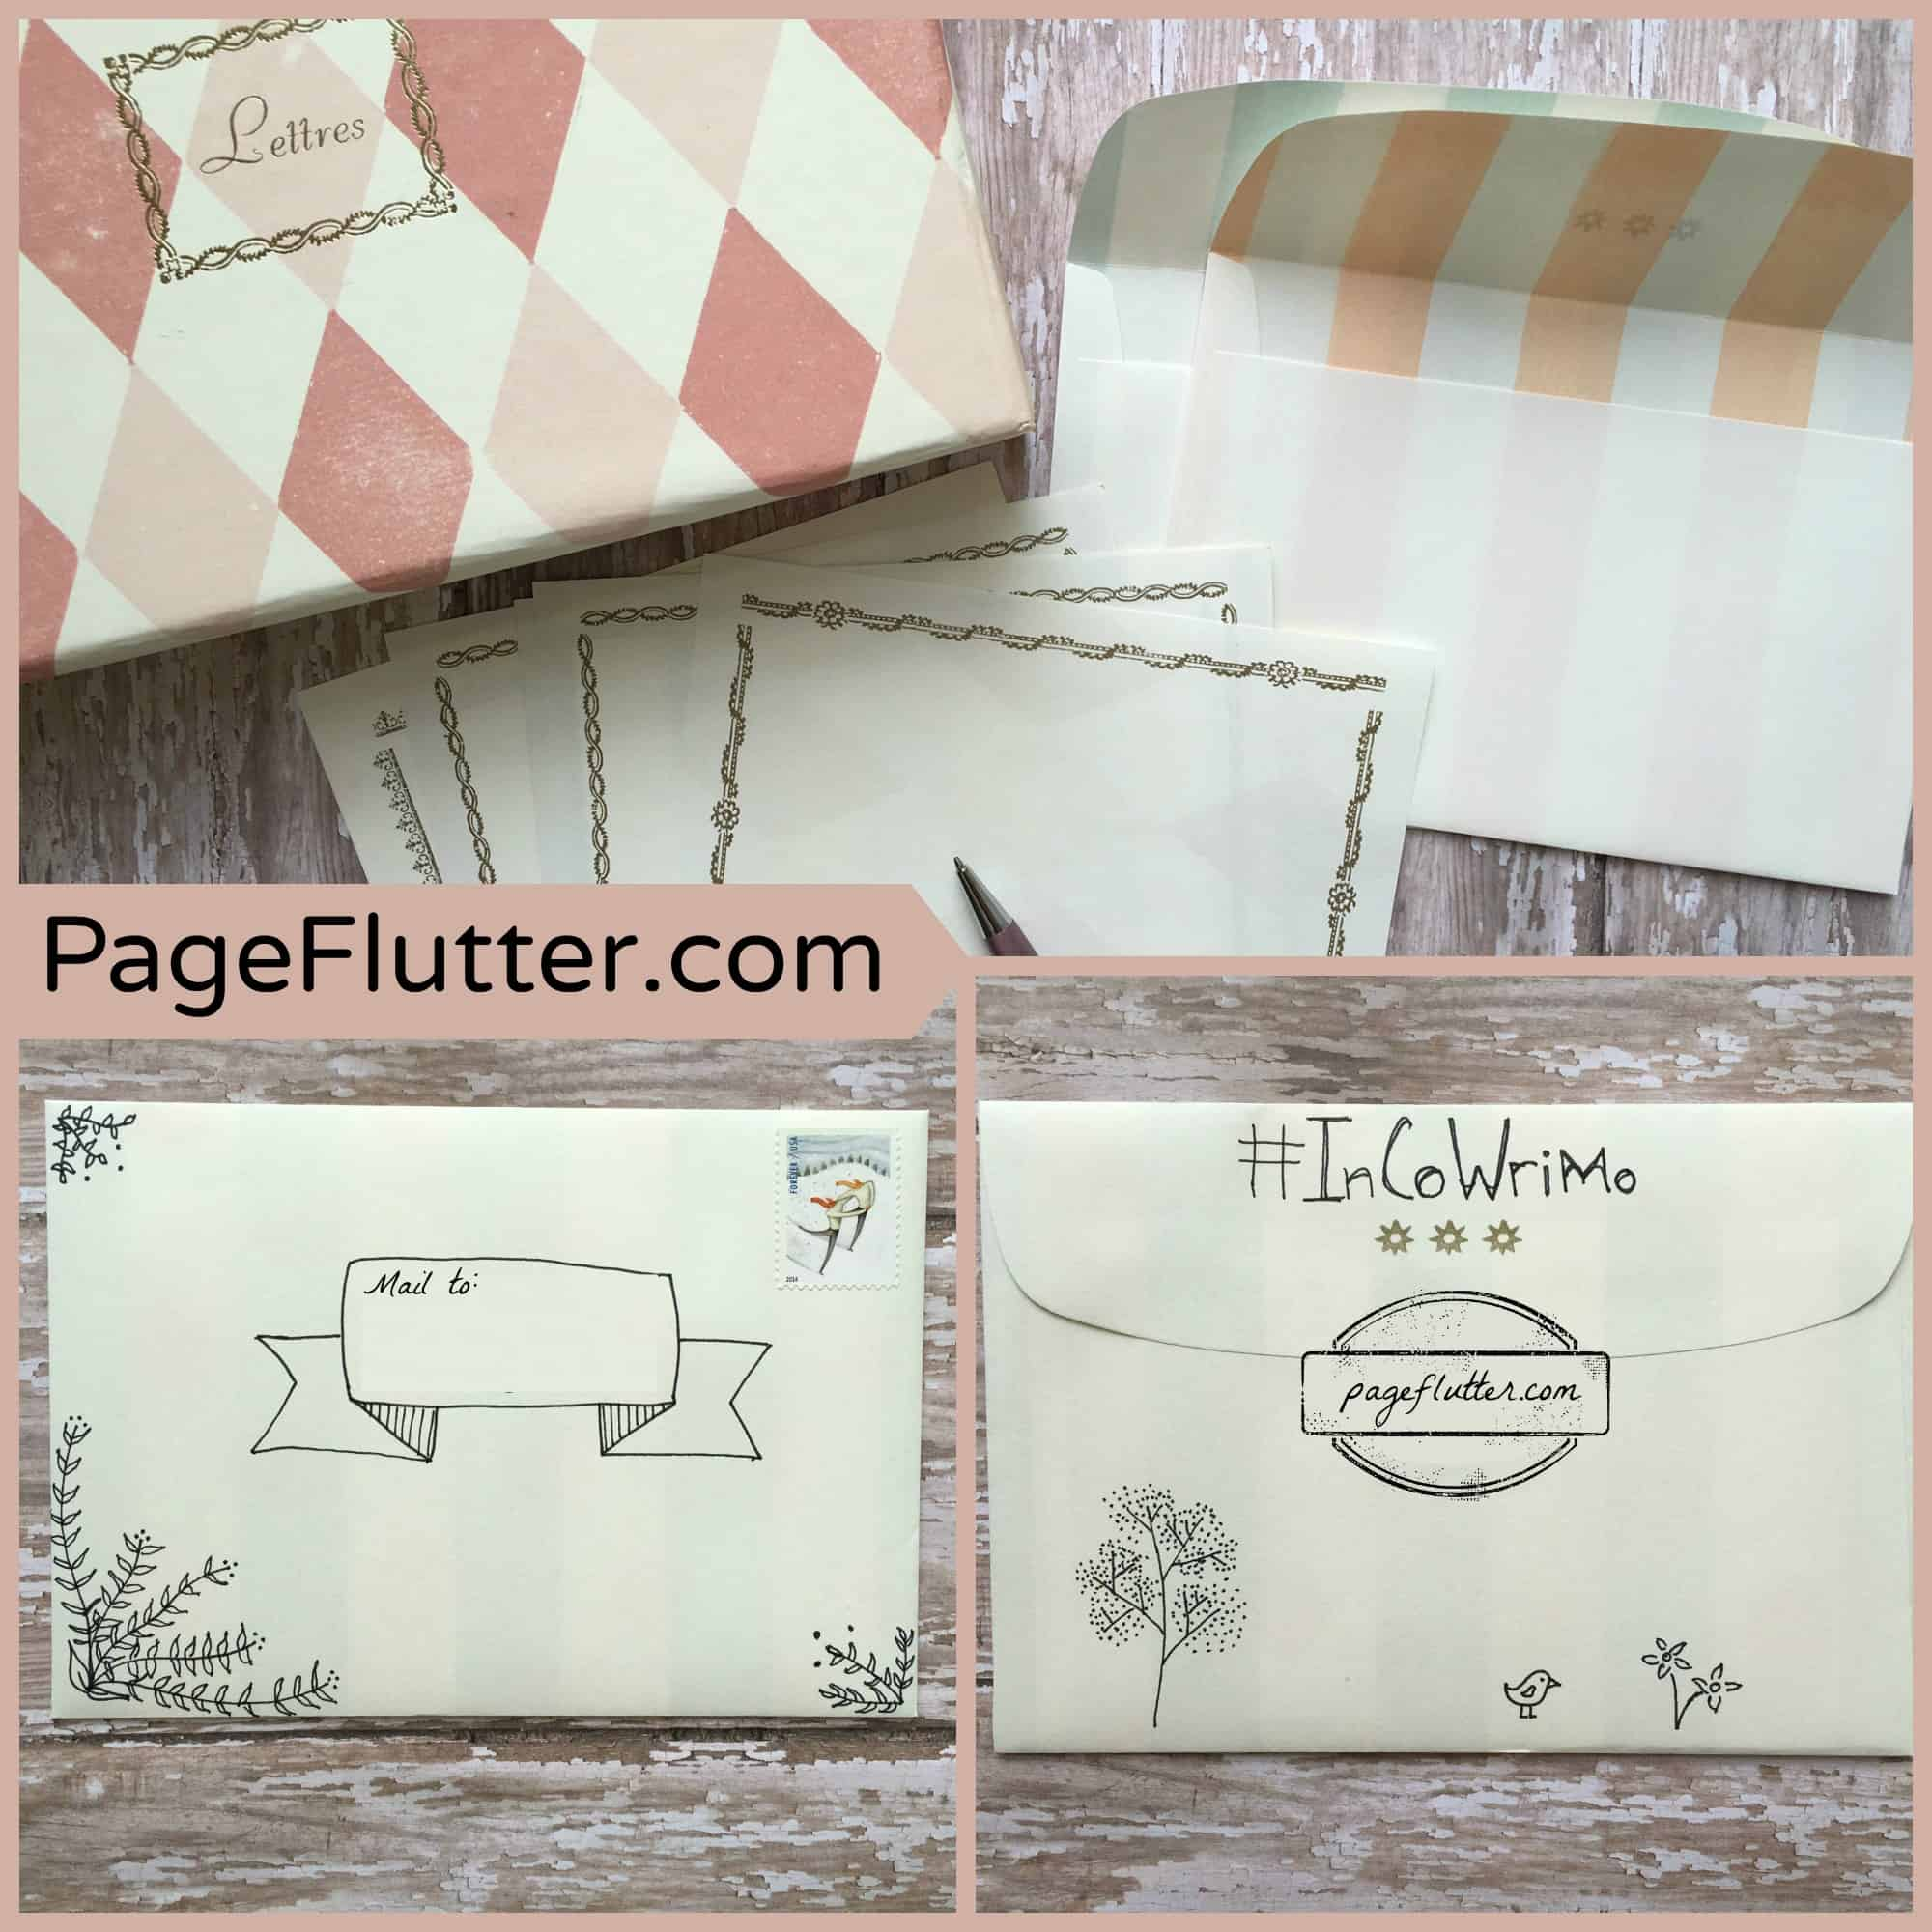 5 Reasons You Should Send Handwritten Letters